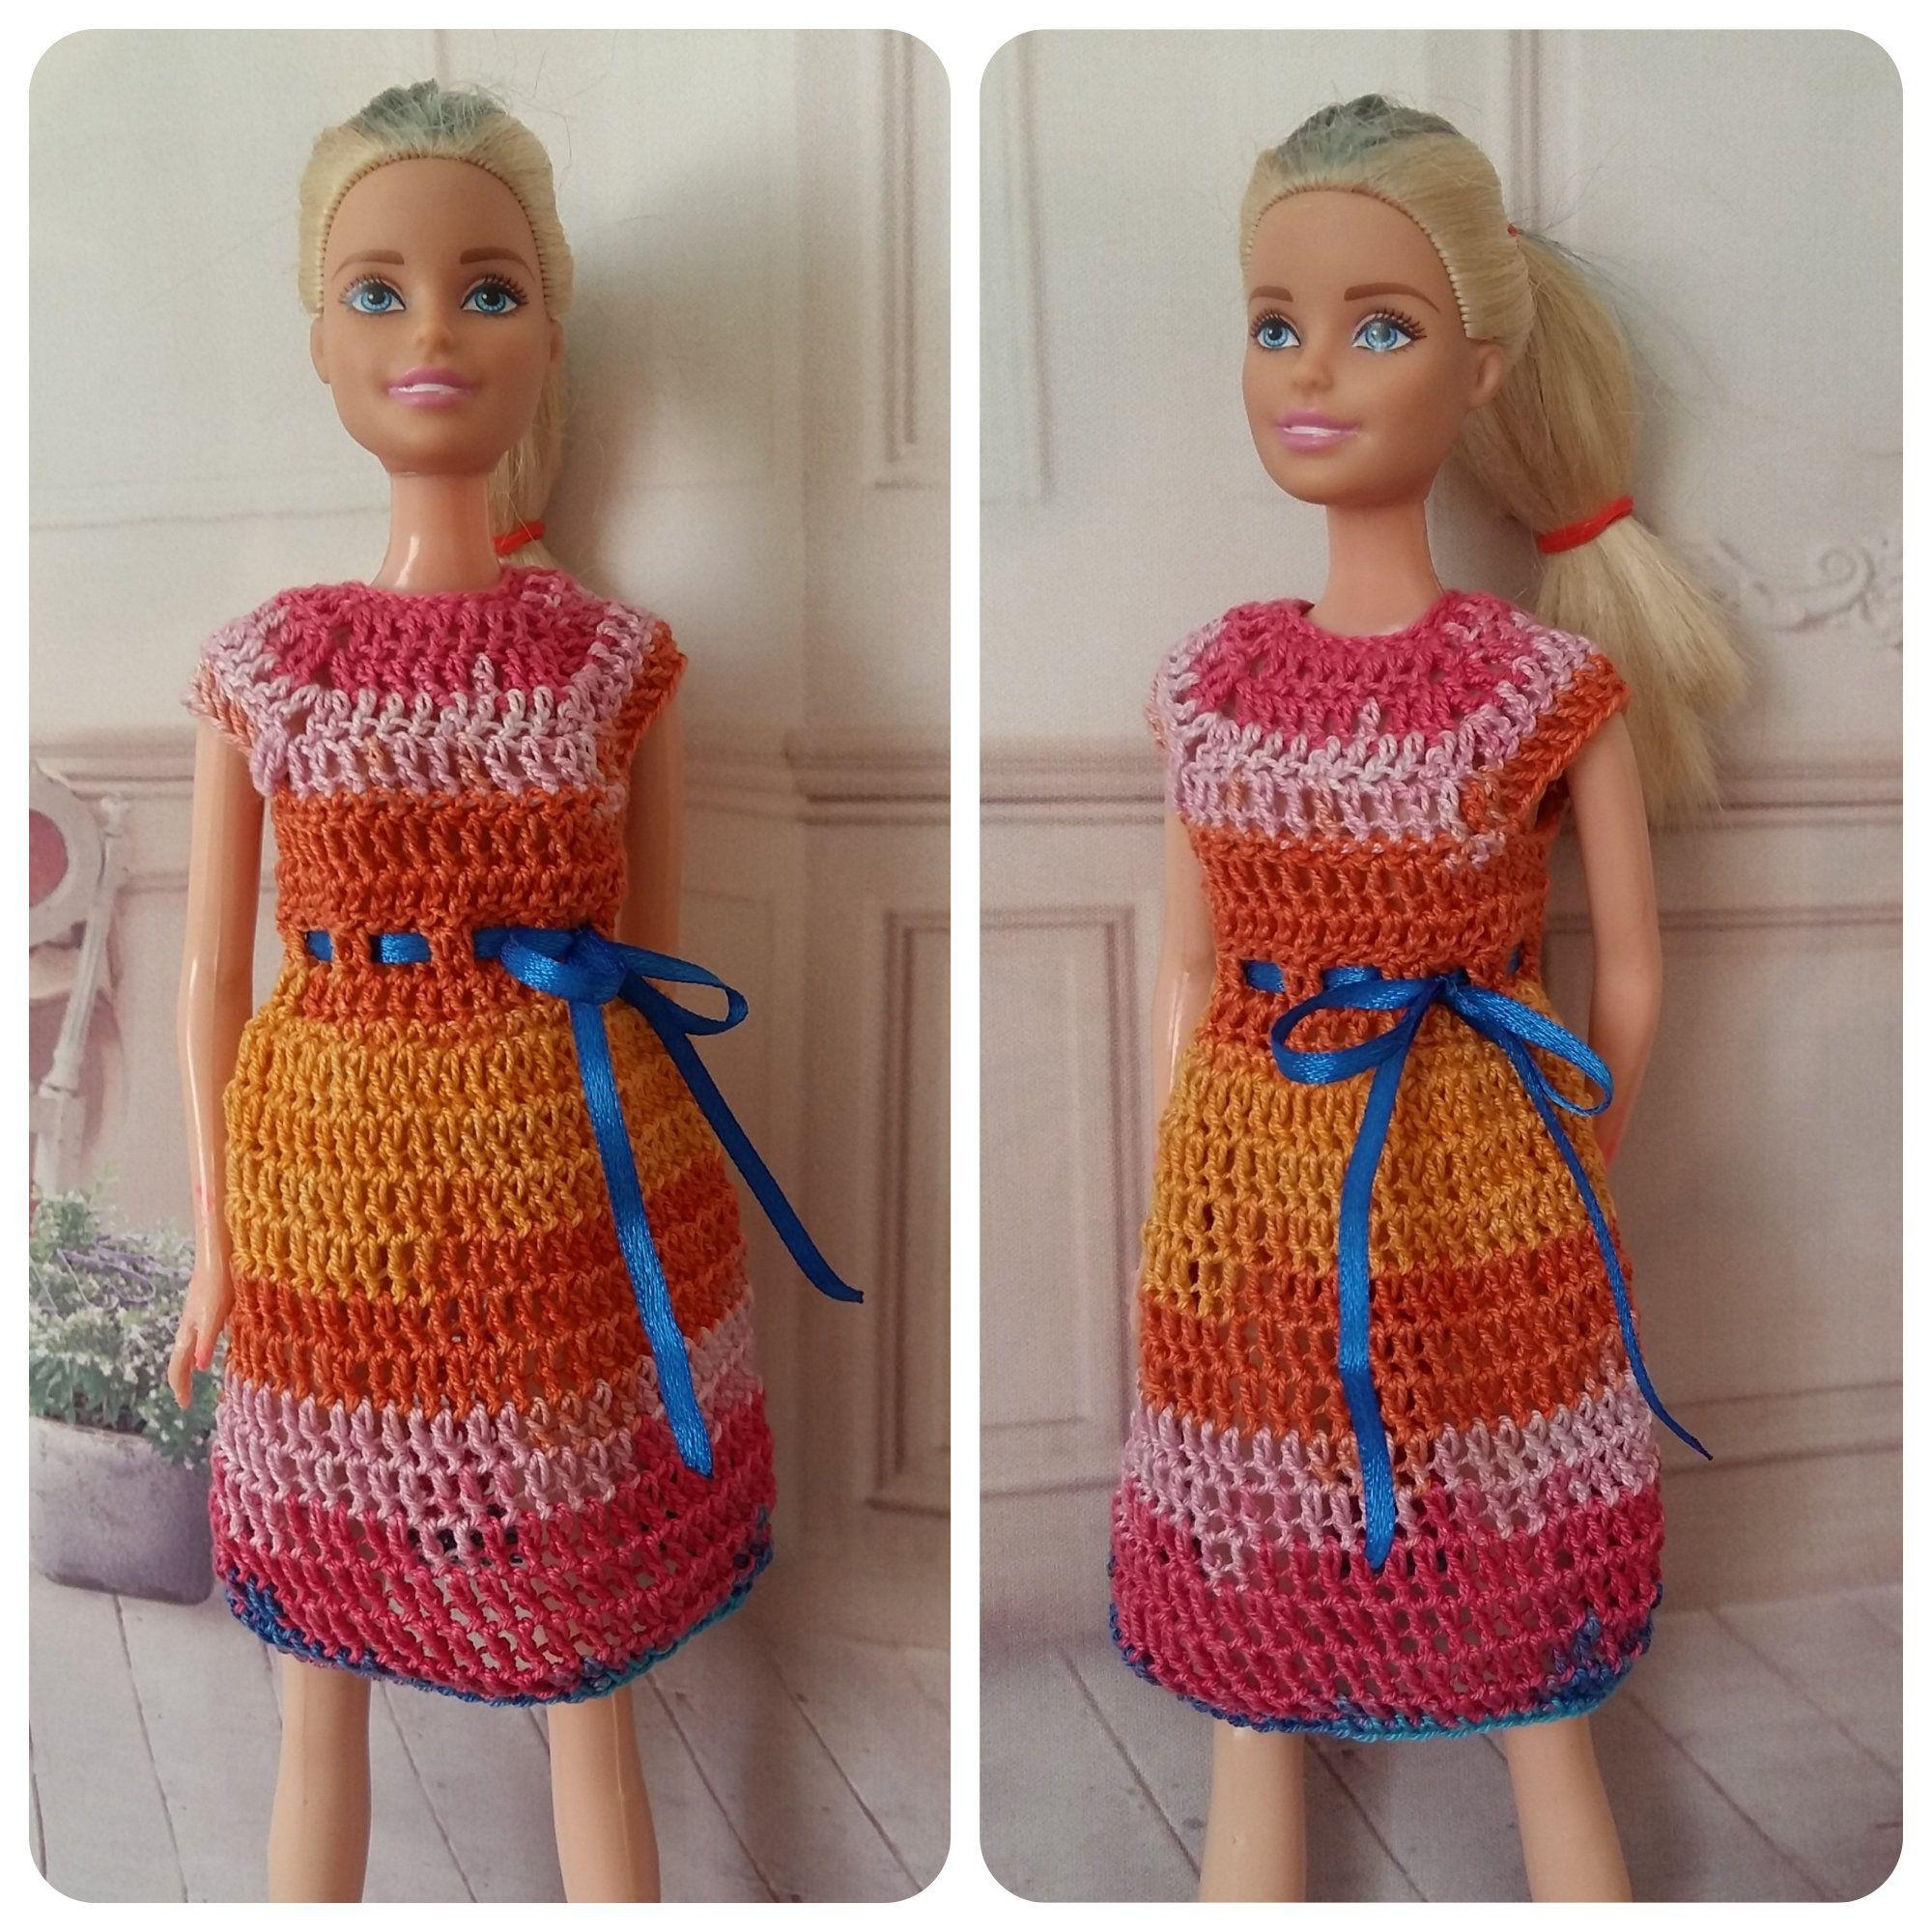 Barbie coat, barbie doll gown, barbie doll sweater, barbie clothes set, Fashionista barbie, Barbie gown Barbie knitting curvy barbie clothes #crochetedbarbiedollclothes